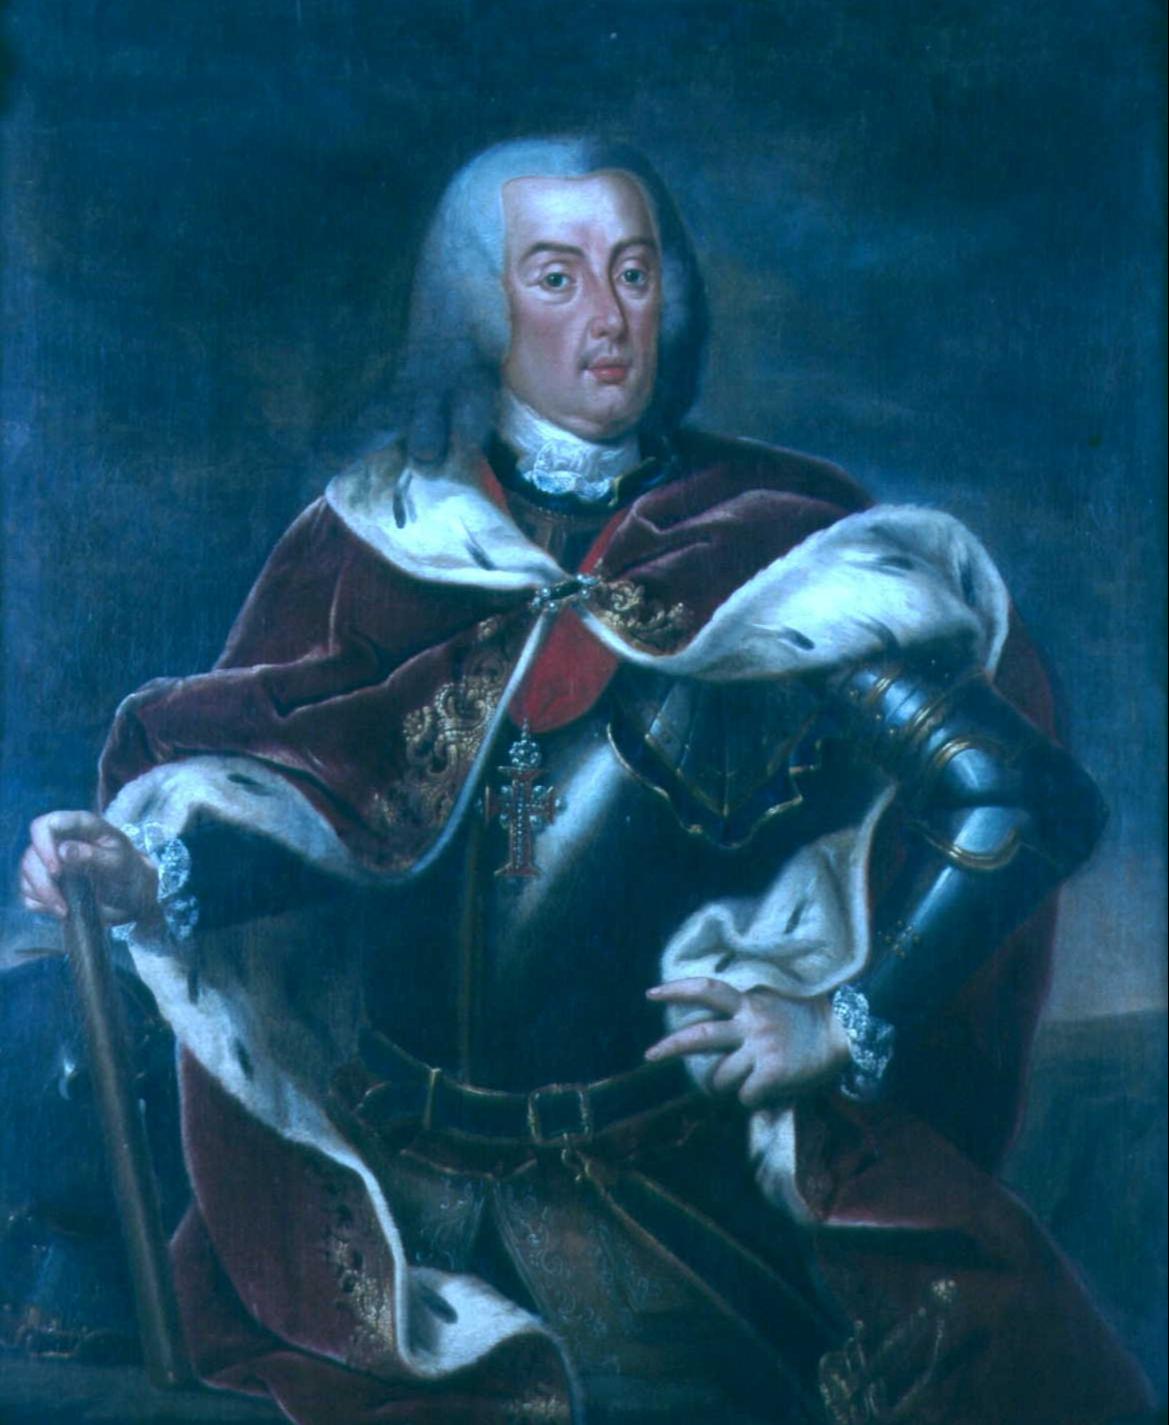 Reinado de D. José I. 1750-1777.